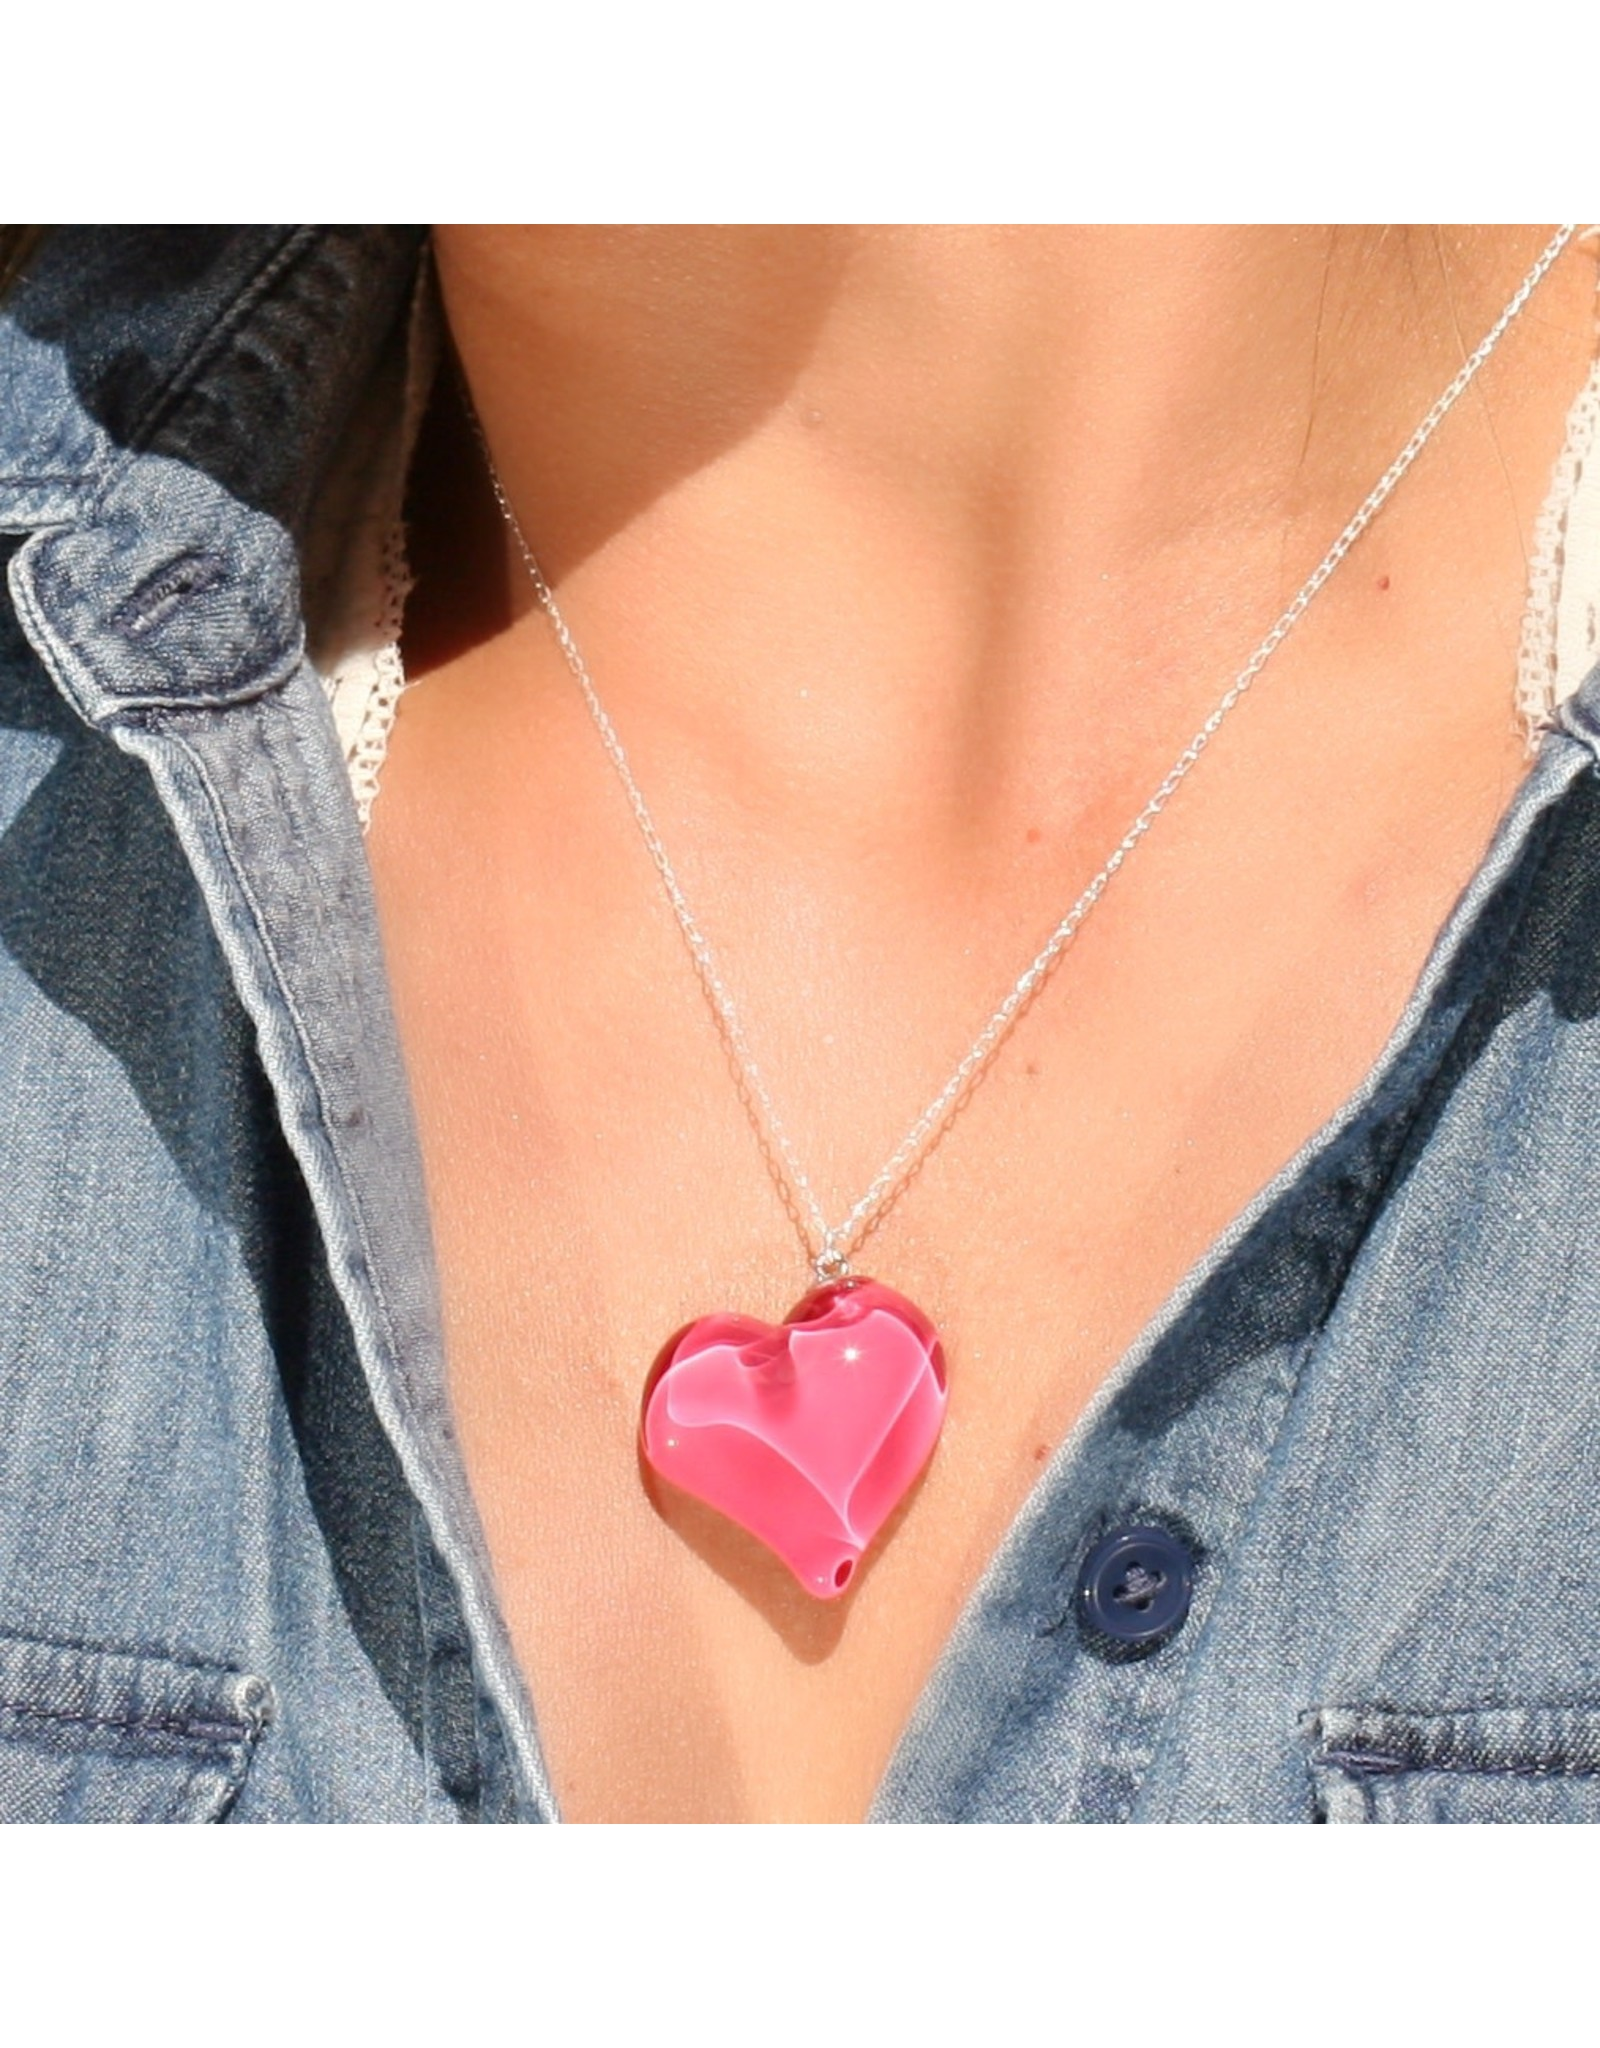 Perfecto Glass PENDANT NECKLACE (Heart)